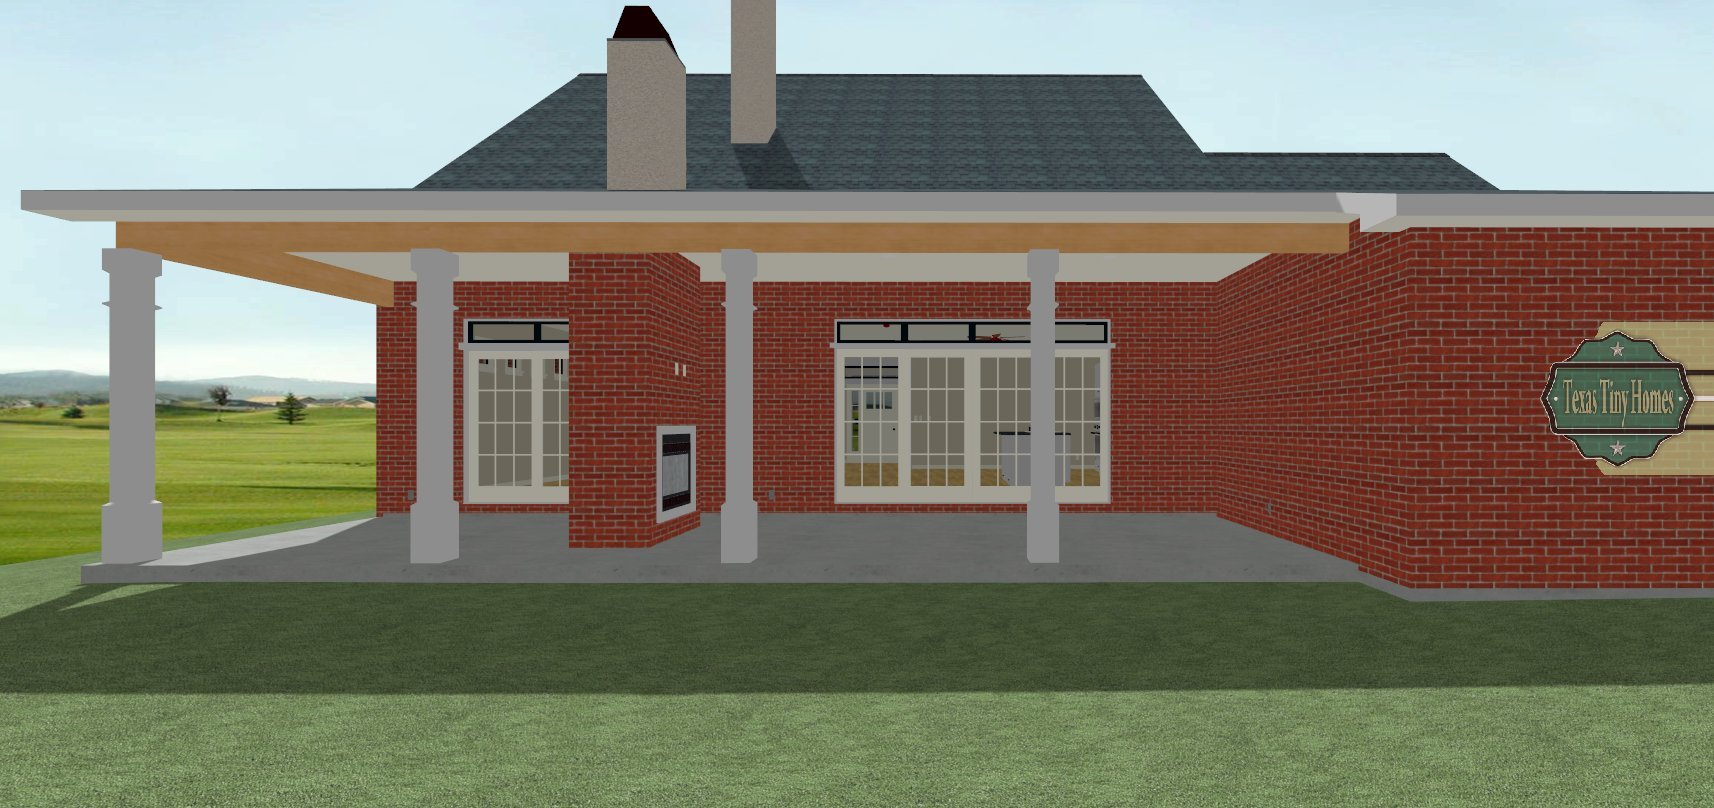 Texas tiny homes plan 1870 for Tiny texas houses plans